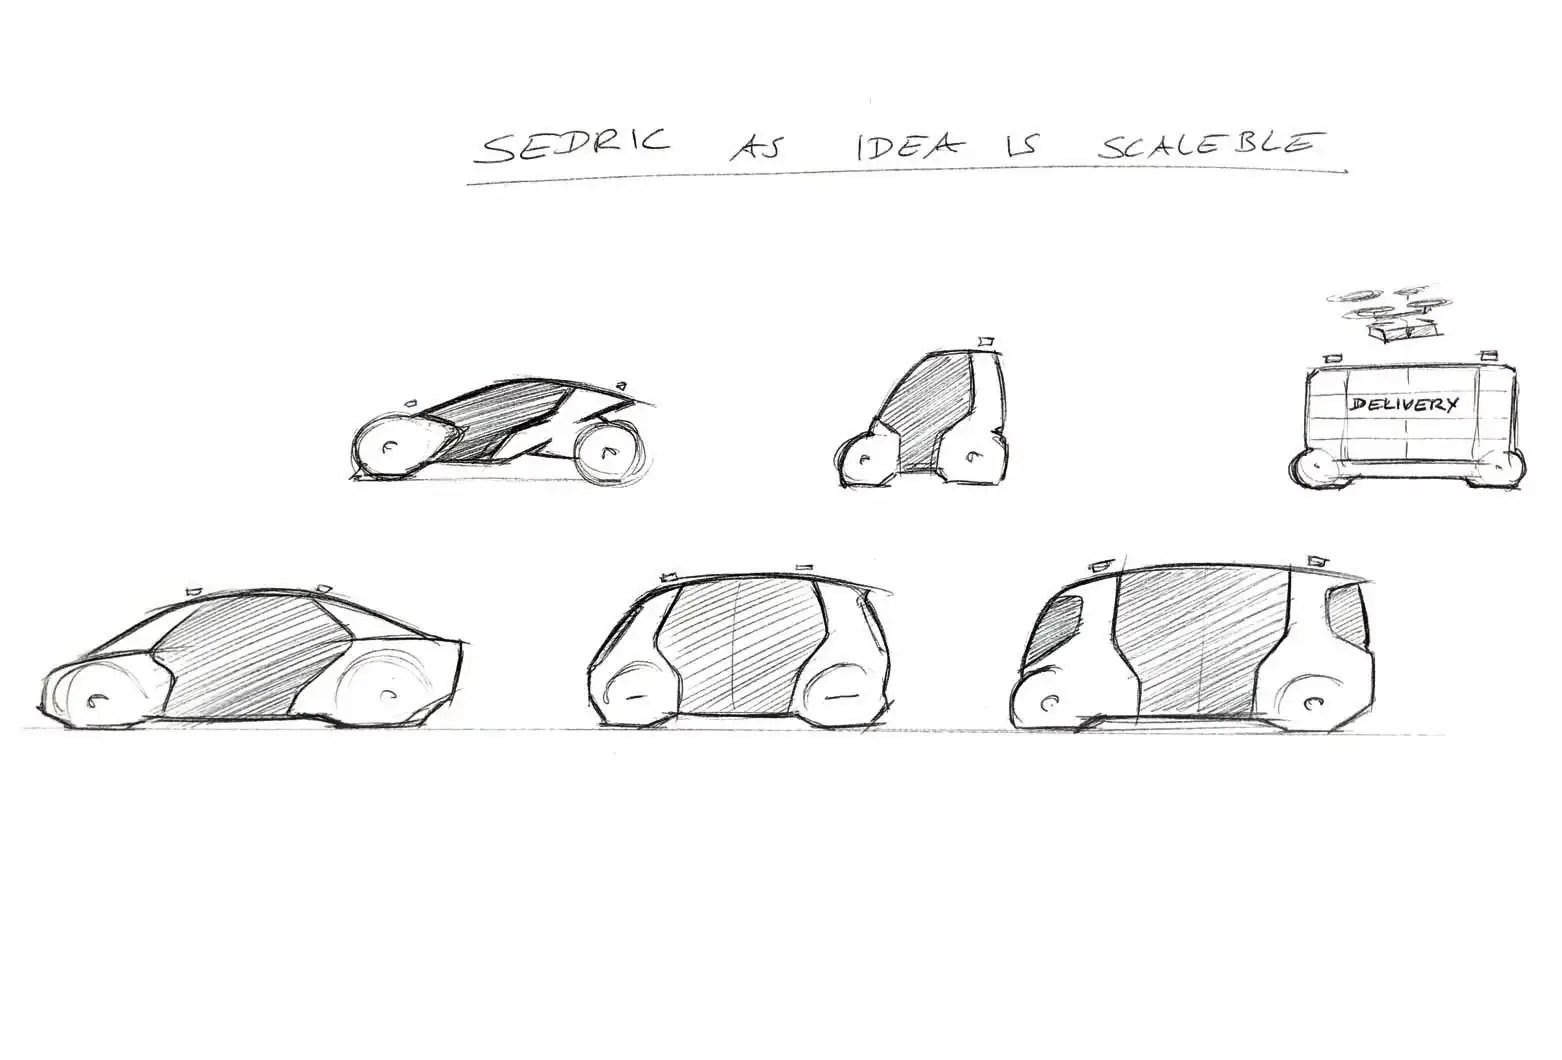 Volkswagen Future Technology Will Influence Car Design